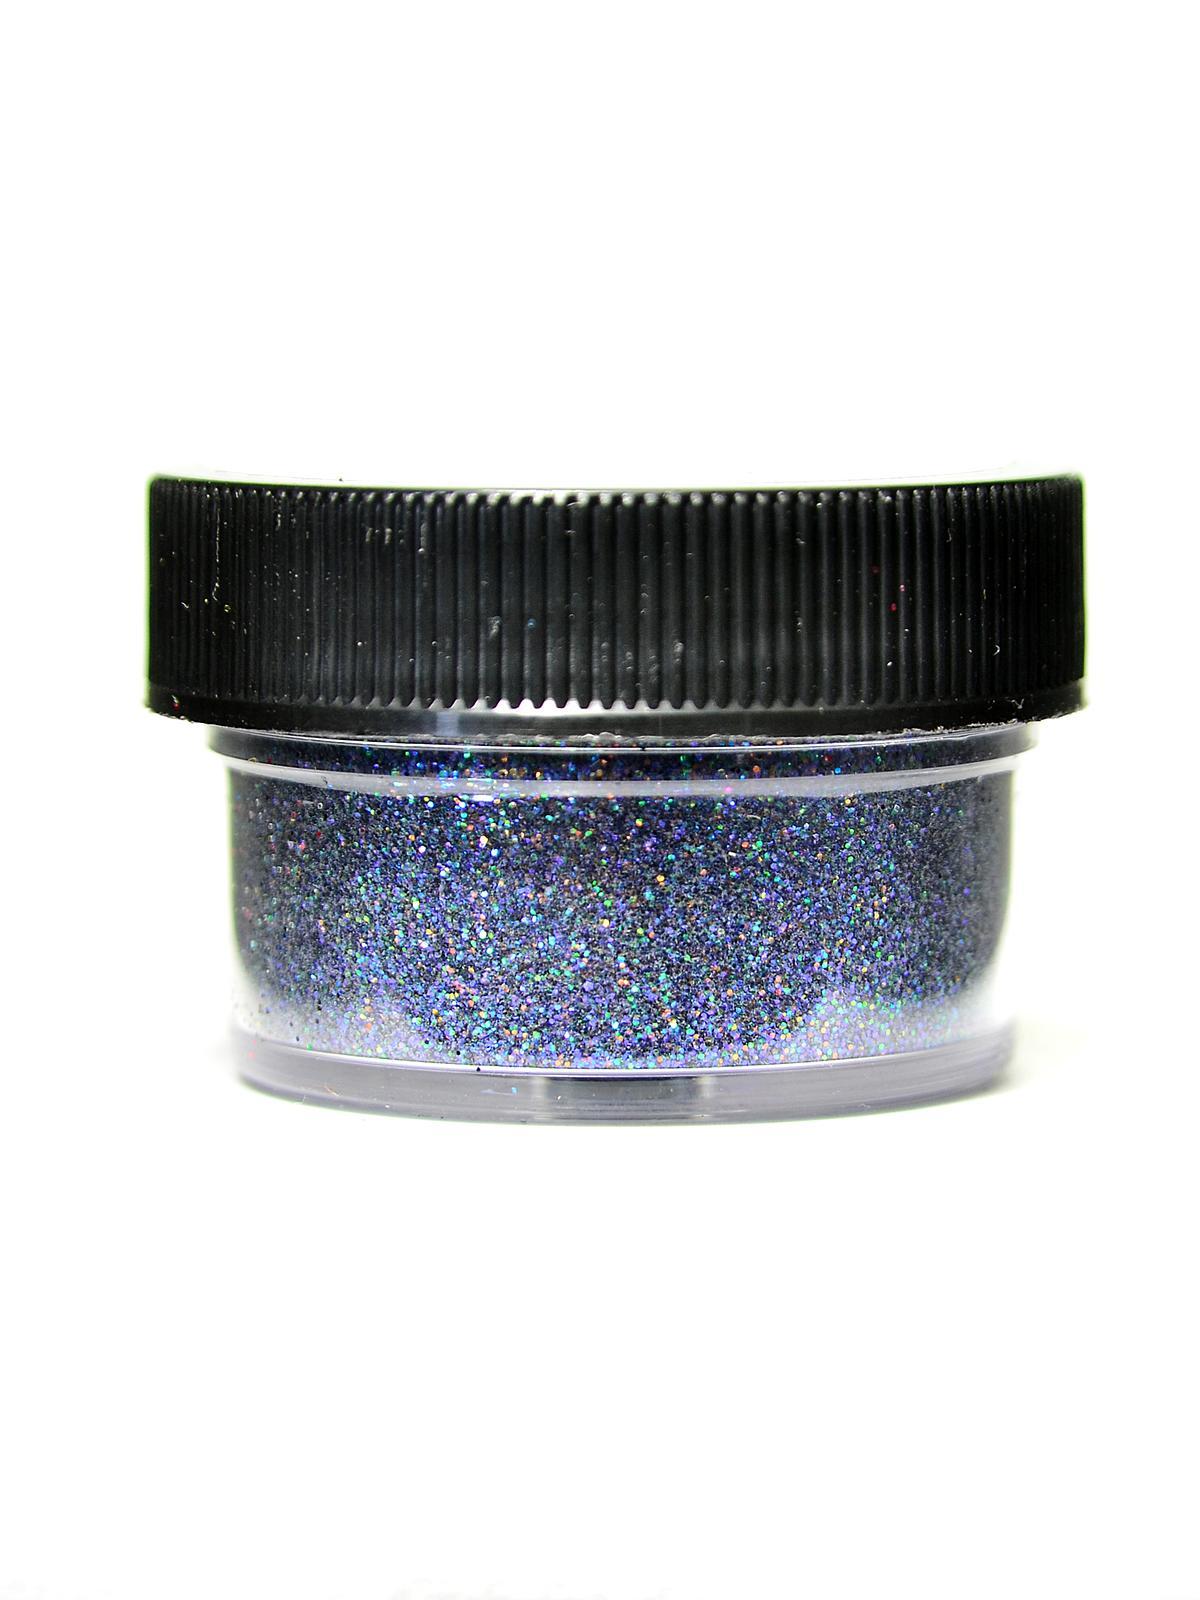 Ultrafine Transparent Glitter Abyss 1 2 Oz. Jar